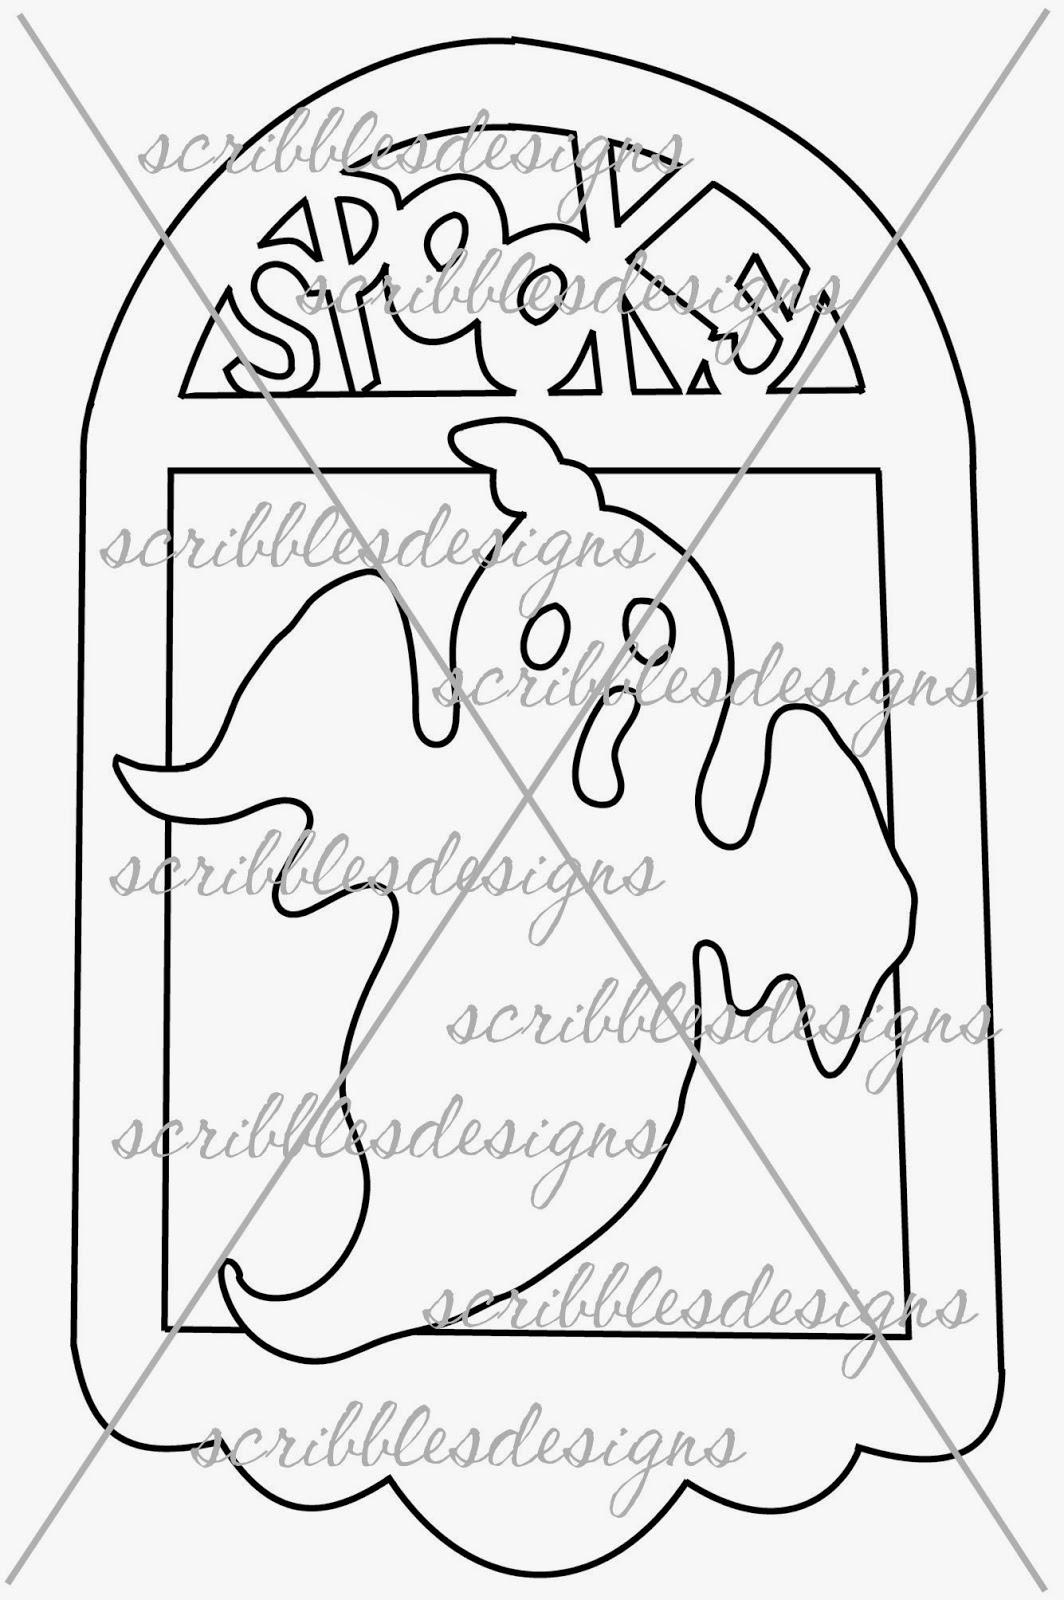 http://buyscribblesdesigns.blogspot.ca/2013/09/822-spooky-300.html